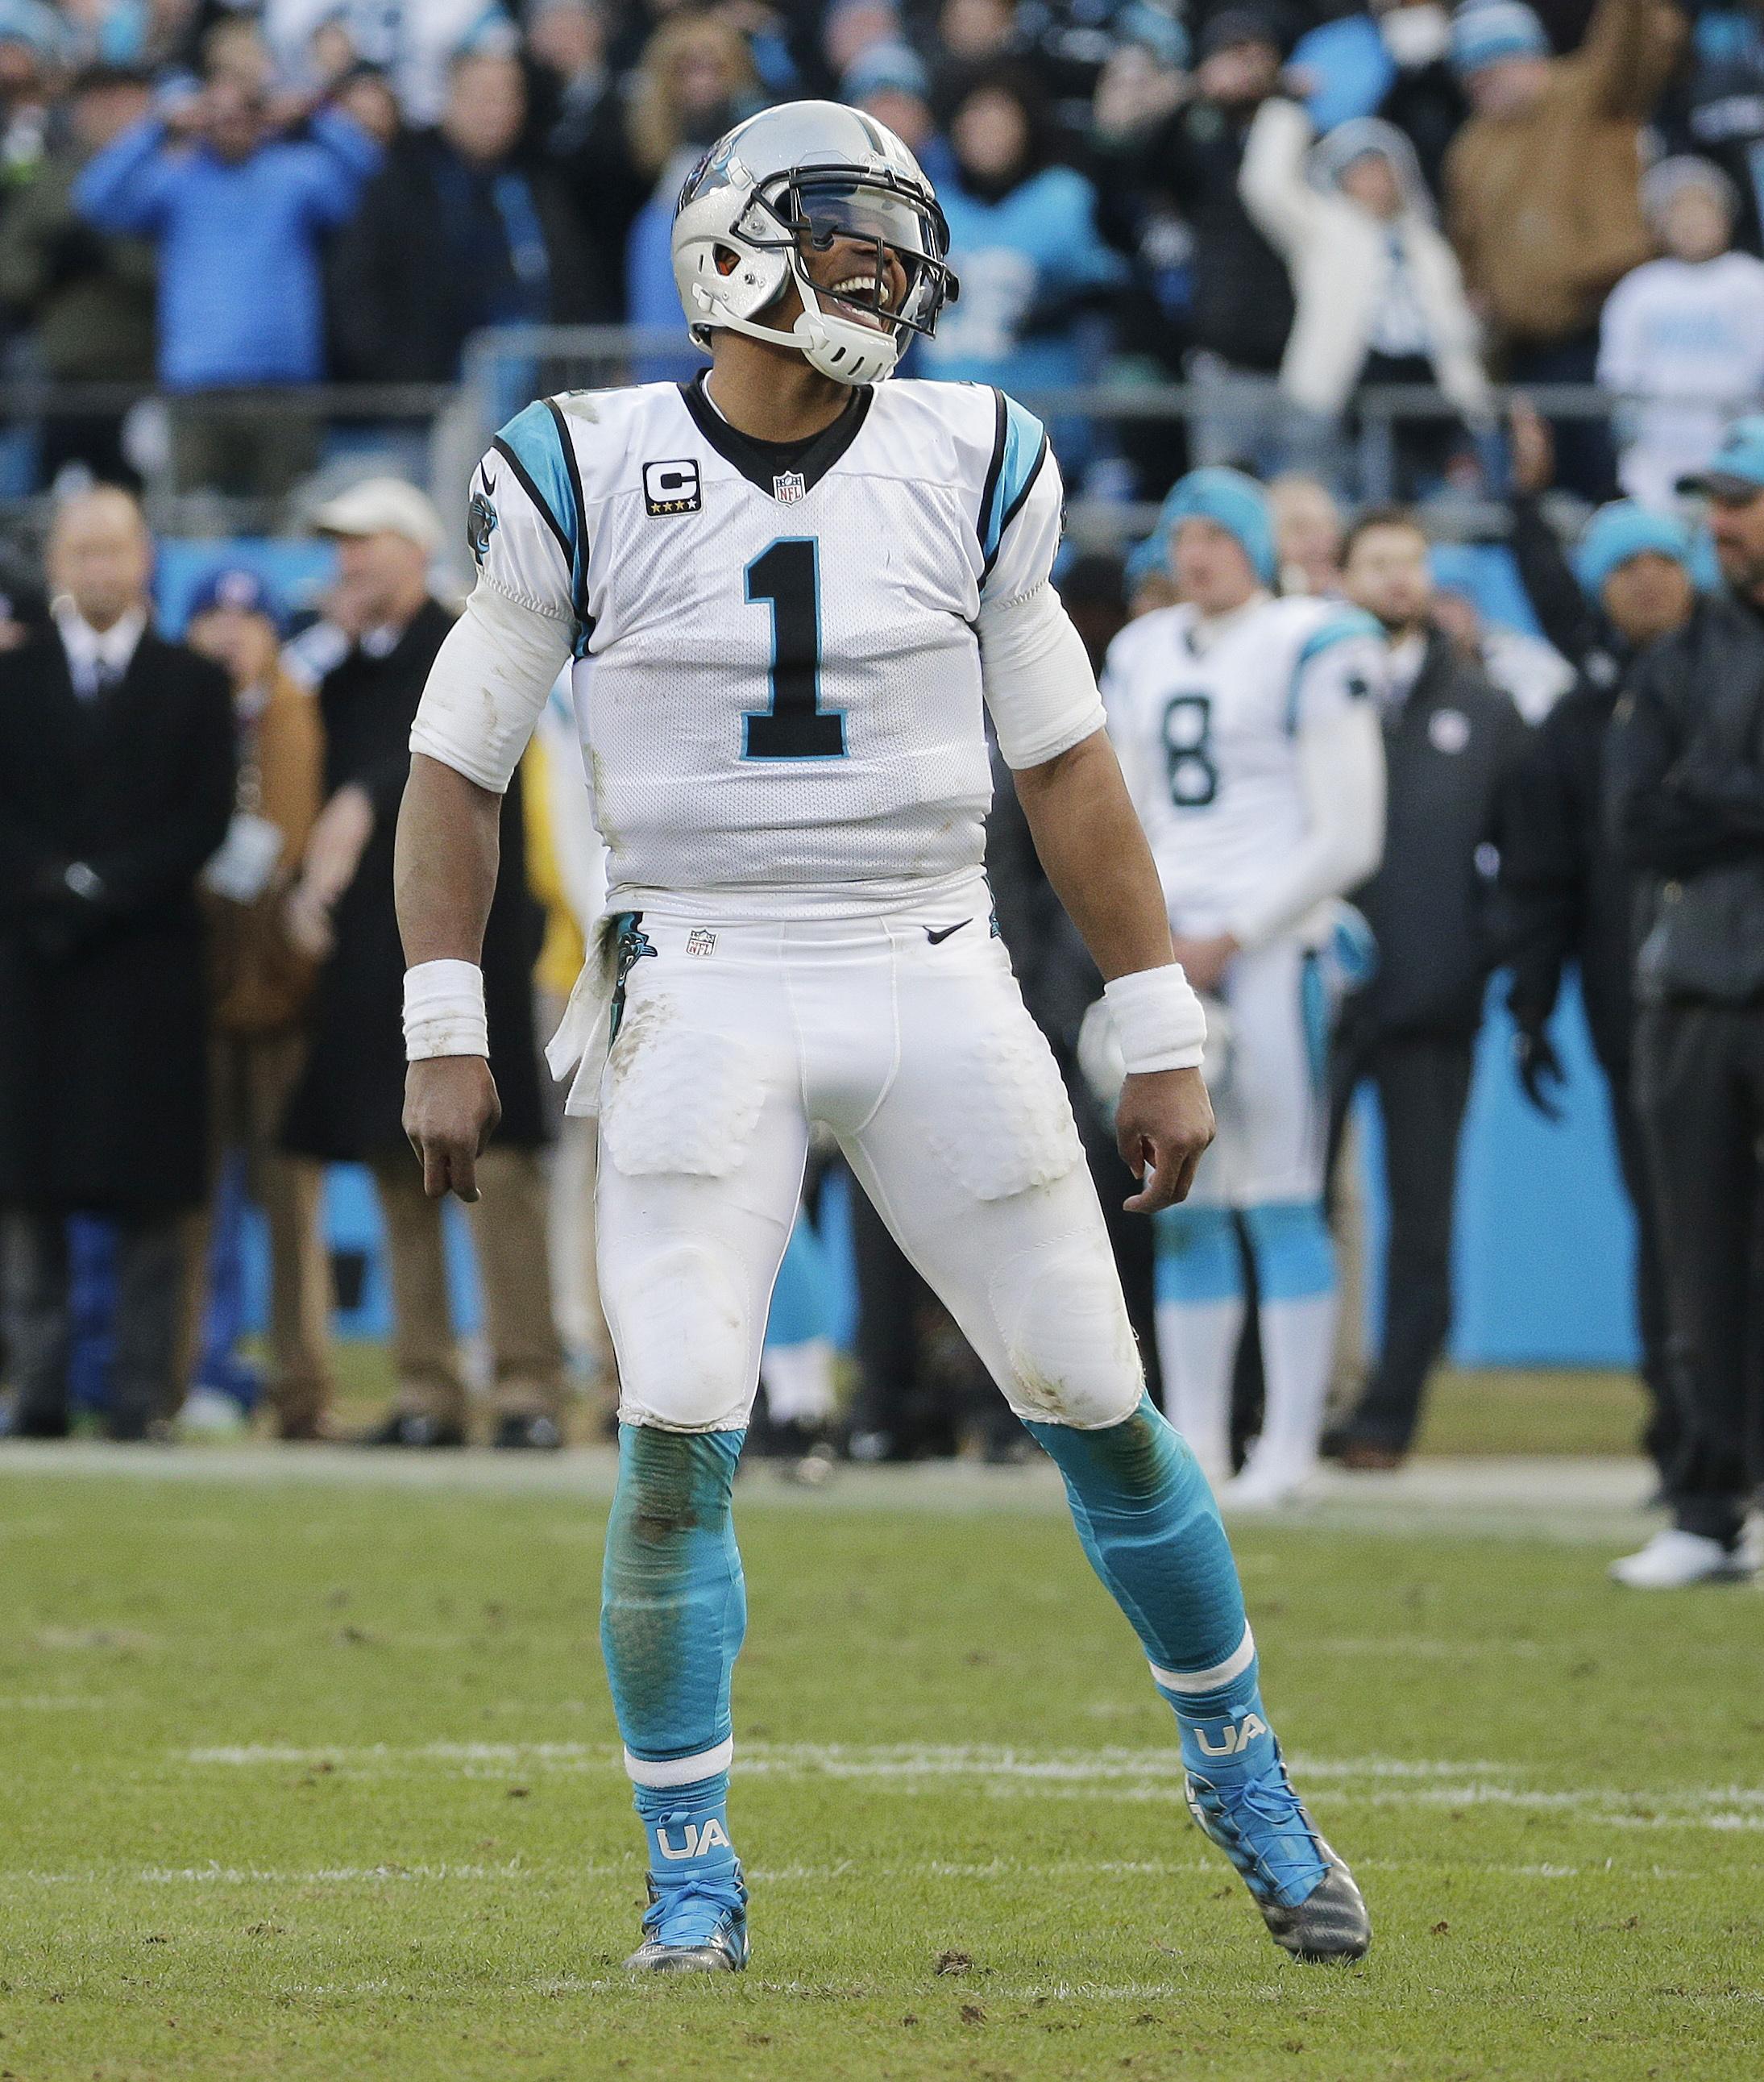 Seahawks_Panthers_Football.JPG_j0m5iDJ.j